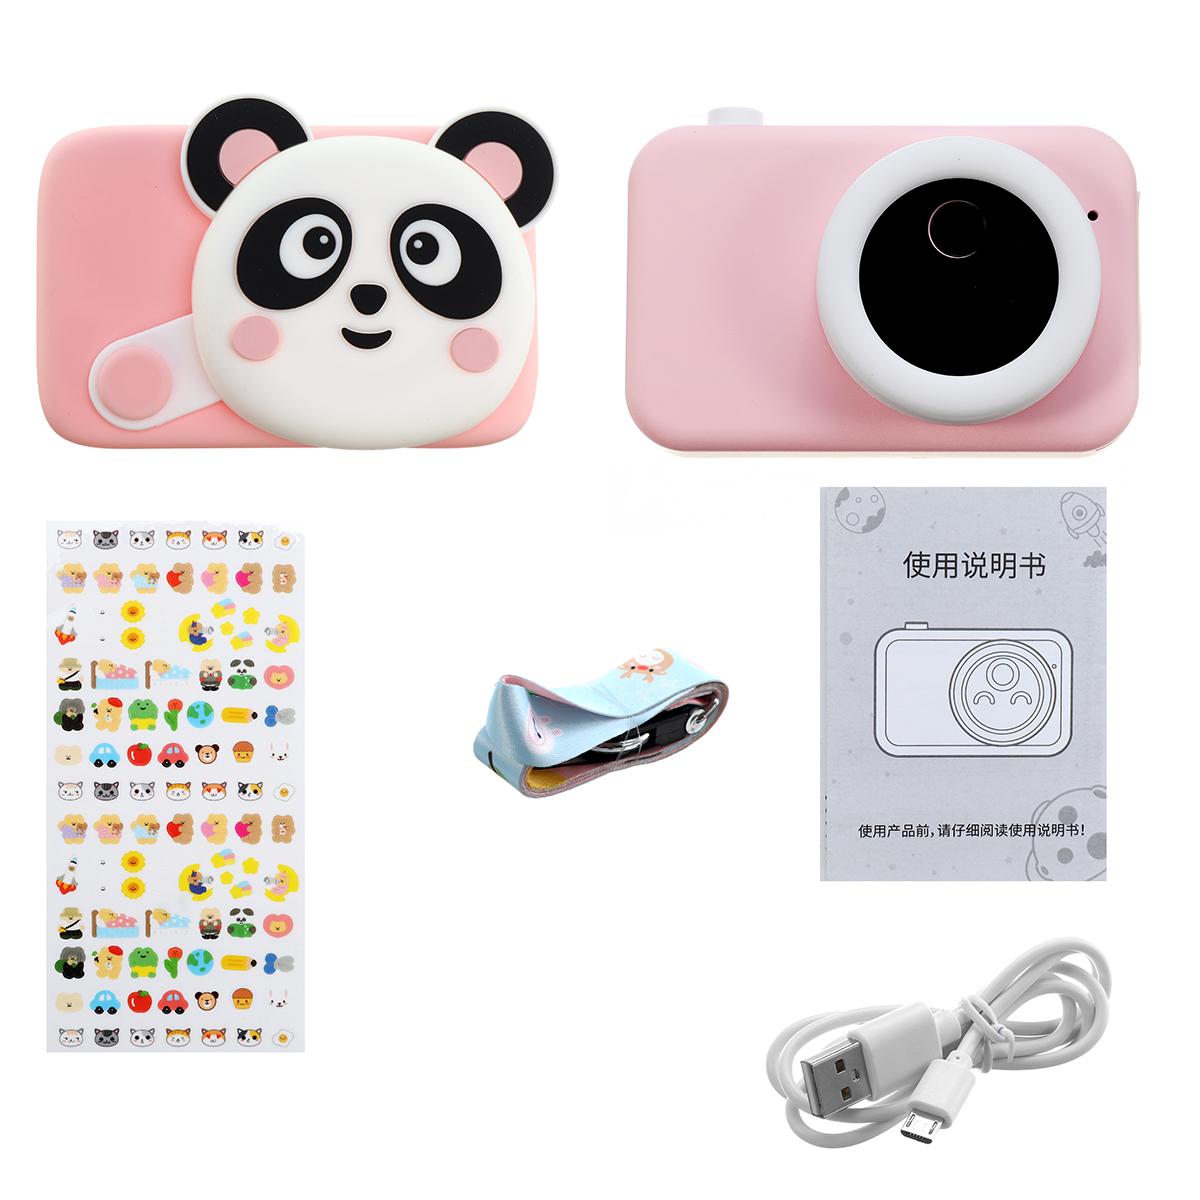 Creative Panda Cartoon Digital Camera Baby Photography Training Educational Toys with 16/32G TF Card for Kids Gift - Photo: 11